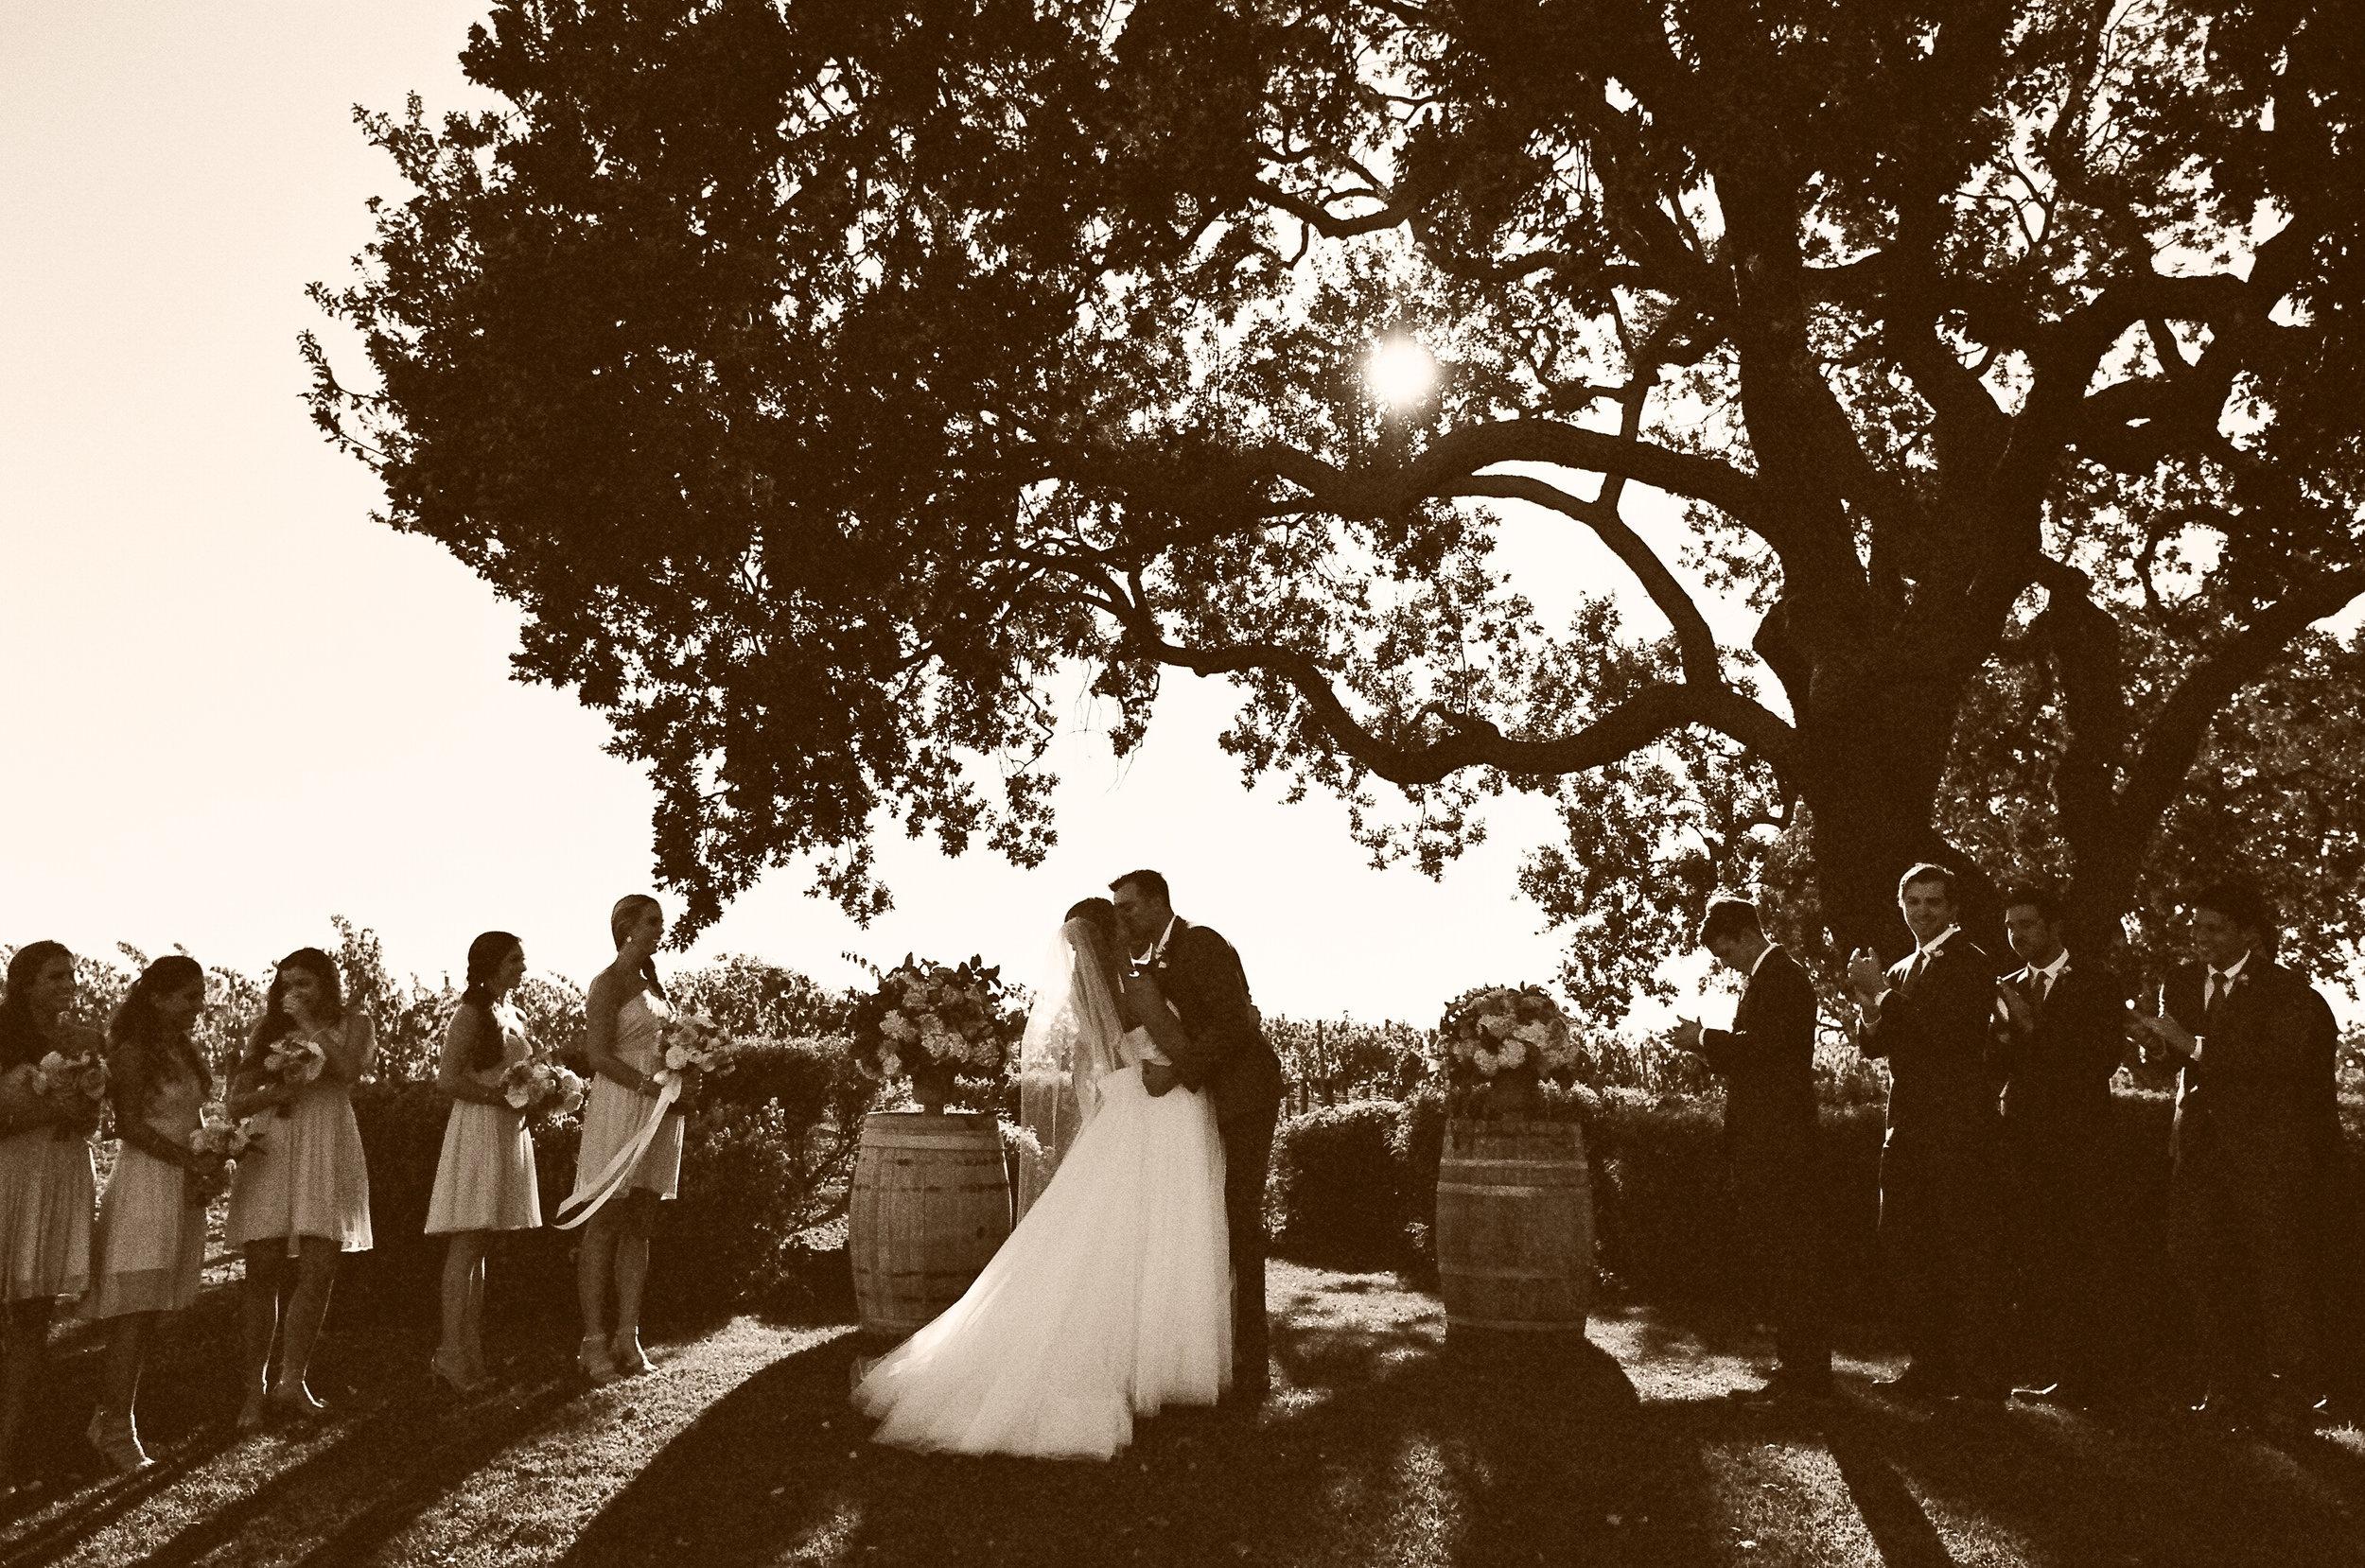 santabarbarawedding.com | Photographer: Beaux Arts Photographie | Peach Garden Wedding at Gainey Vineyard